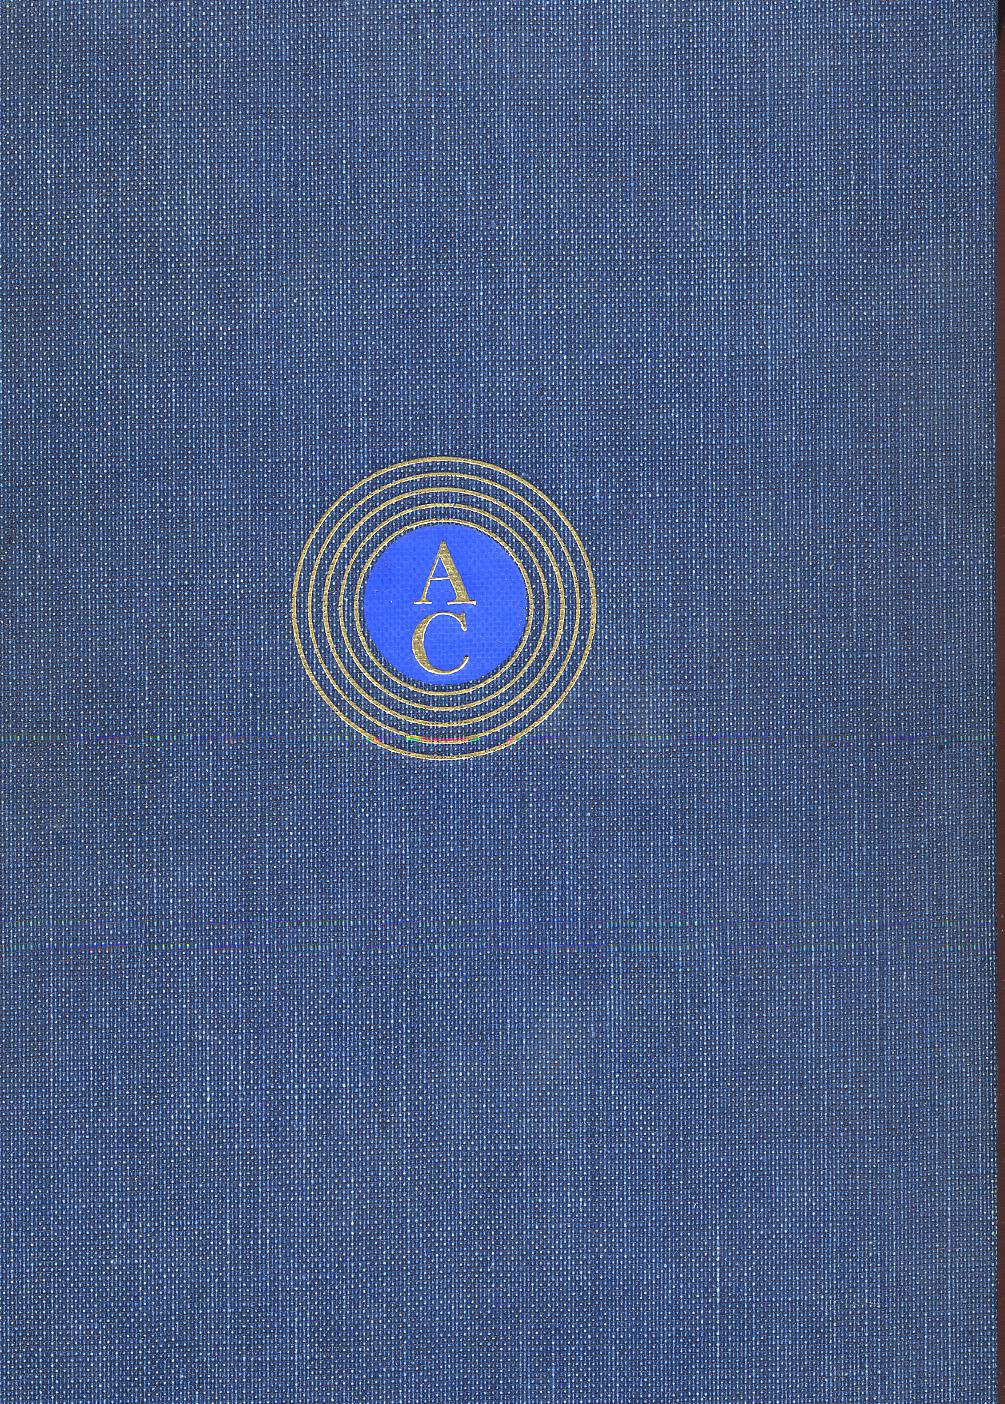 Enciclopedia Garzanti - Vol. I